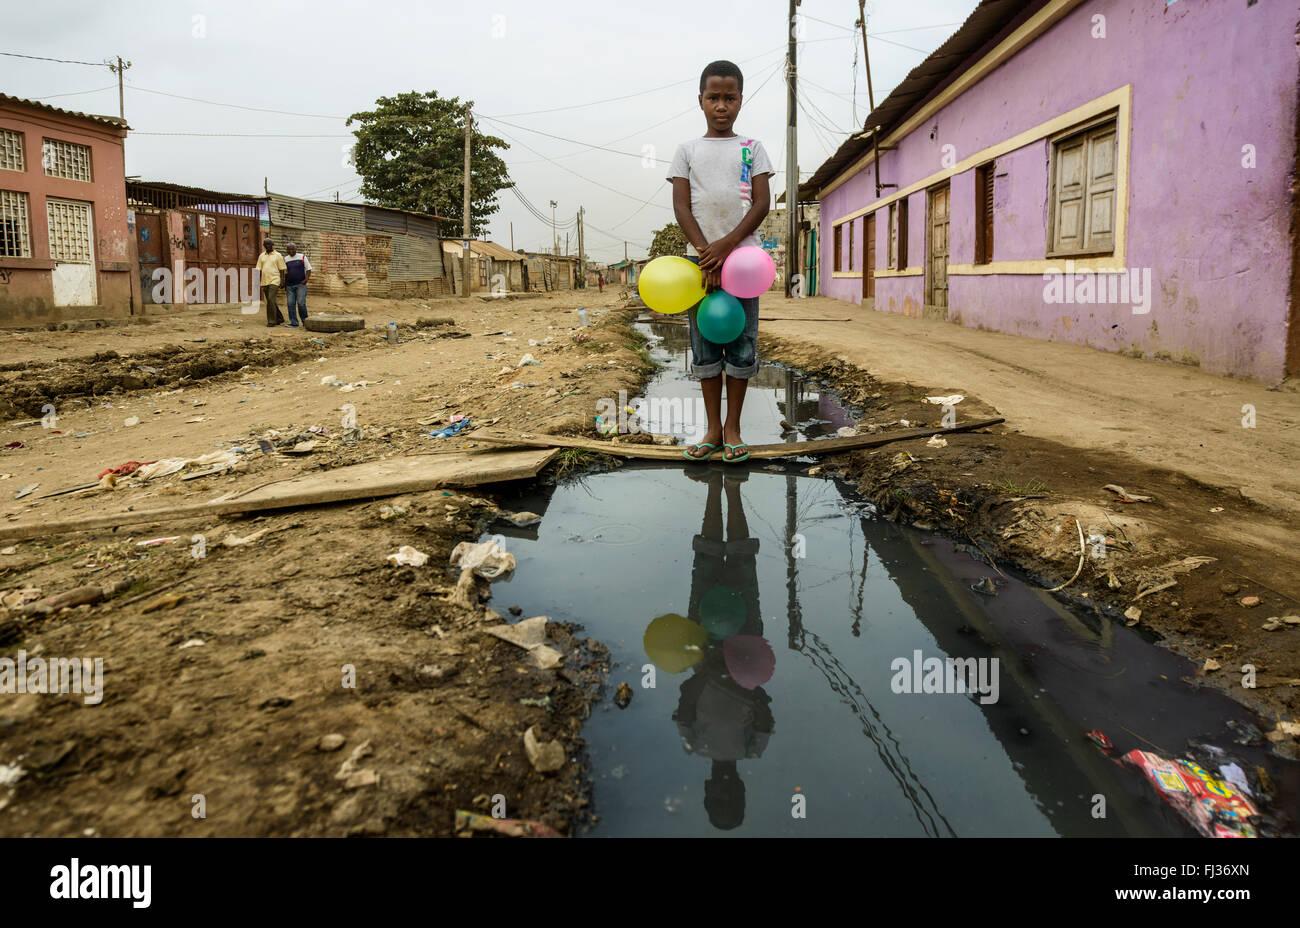 Life in Bairro Rangel, Luanda, Angola, Africa - Stock Image